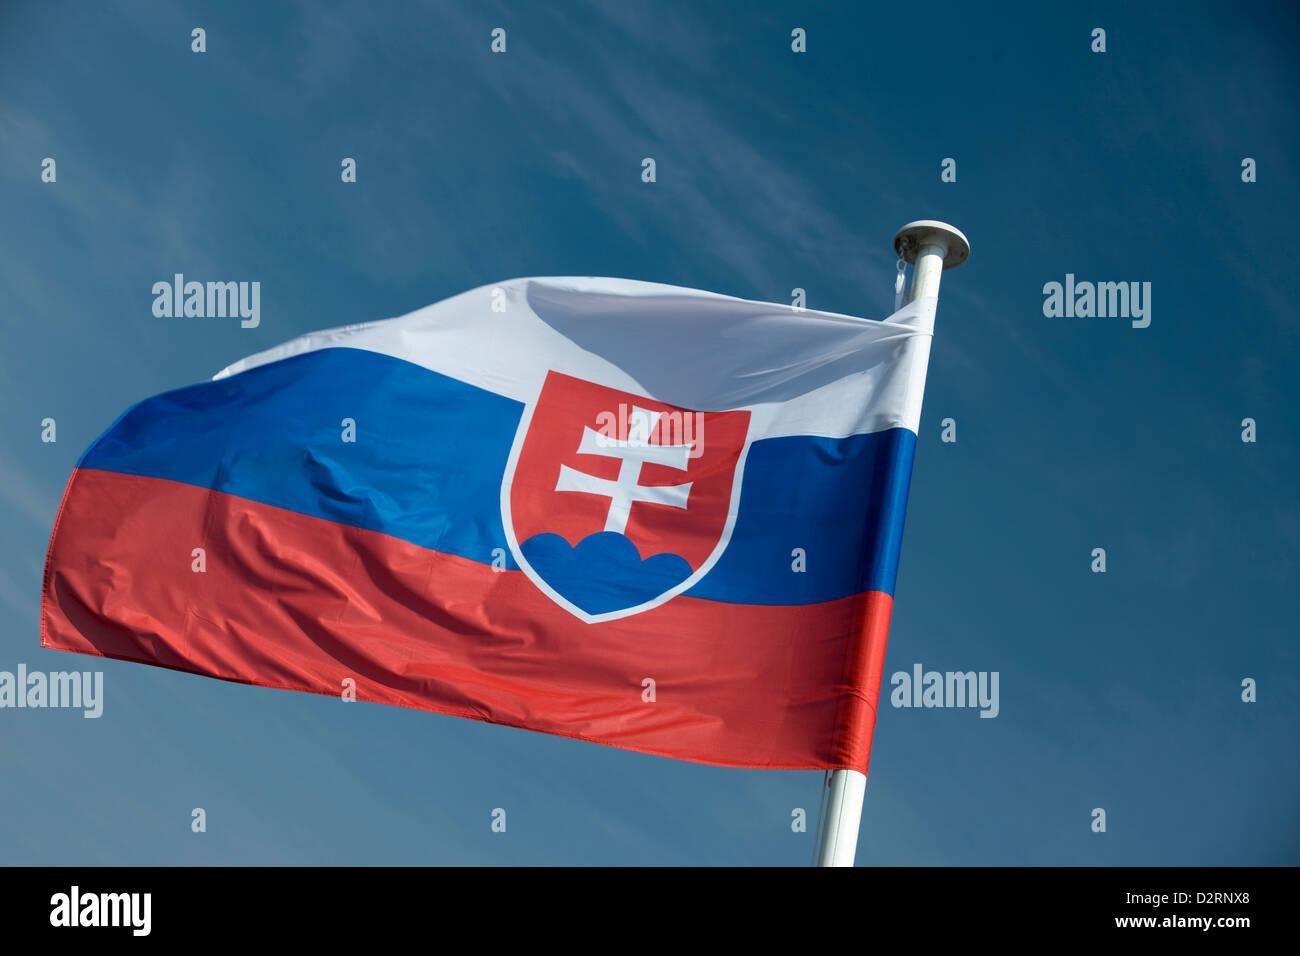 SLOVAKIAN FLAG FLYING ON FLAGPOLE - Stock Image